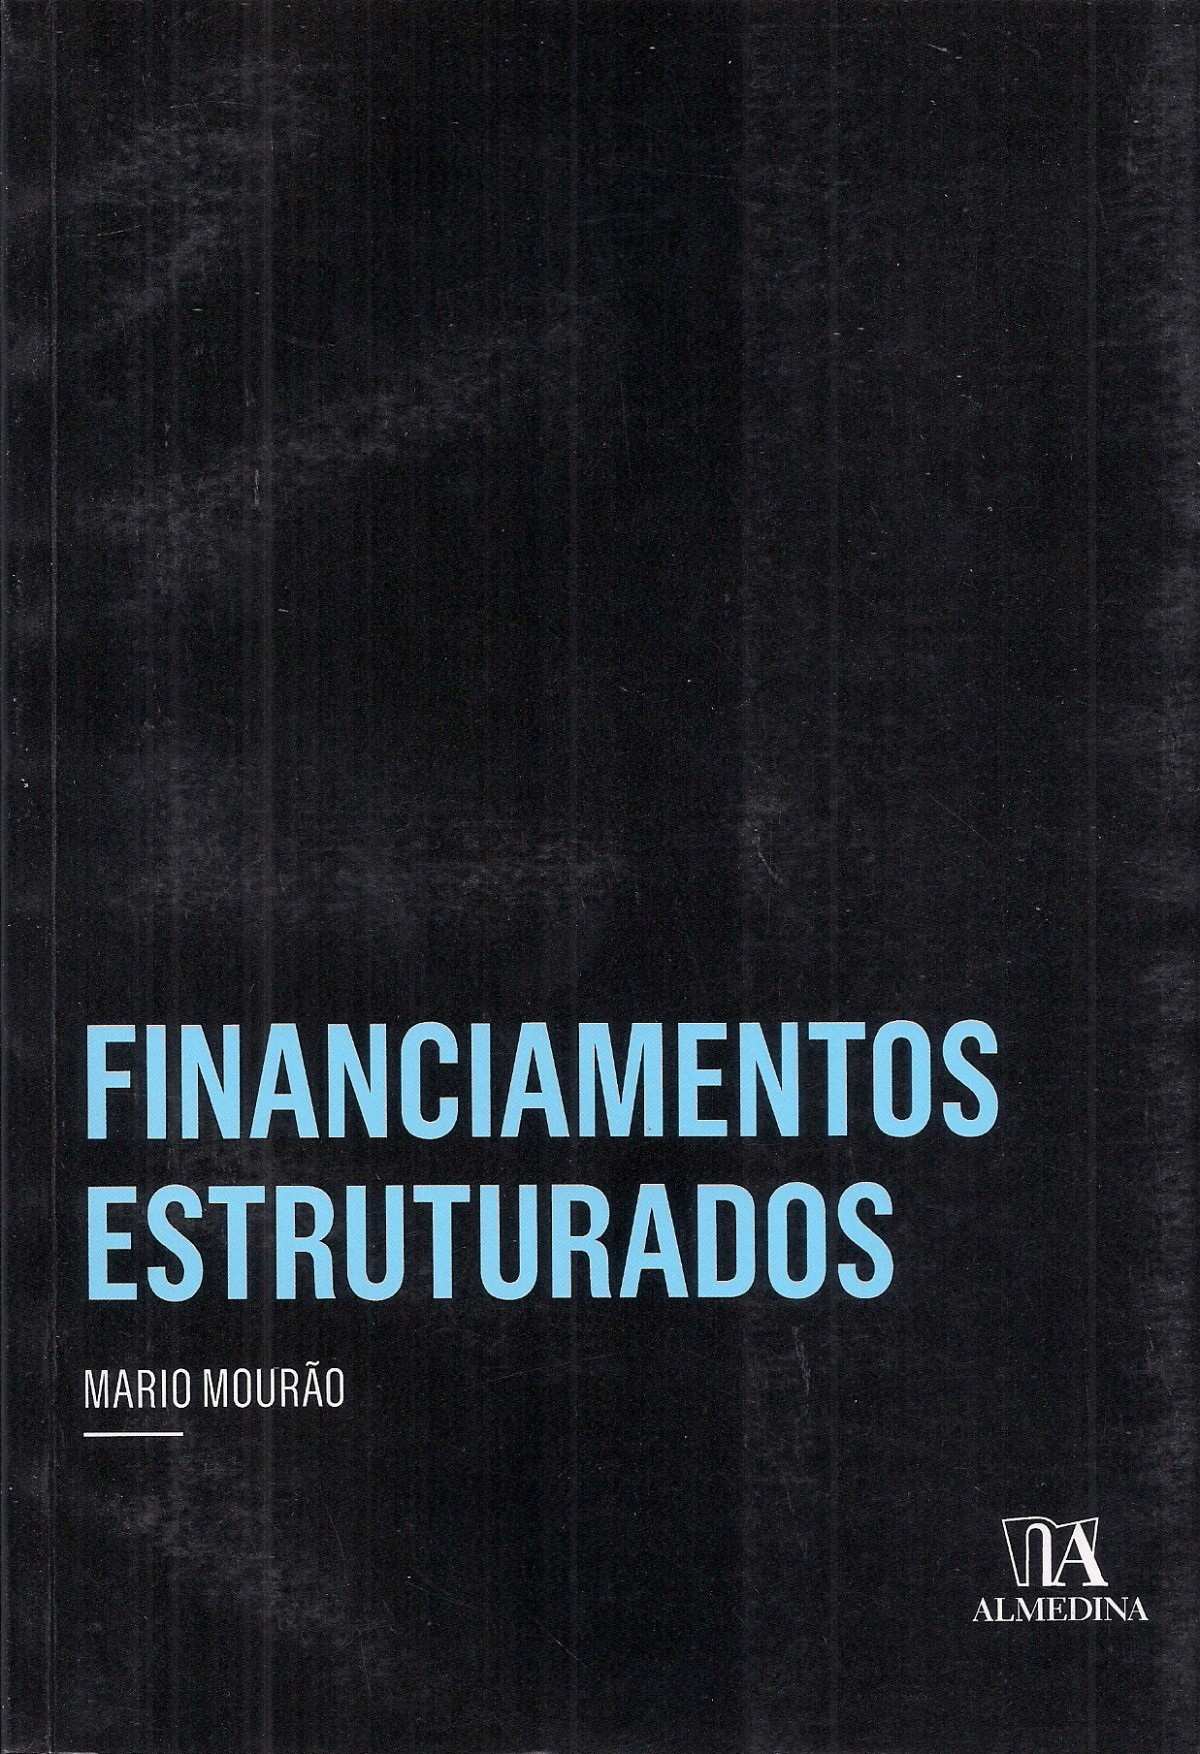 Foto 1 - Financiamentos Estruturados